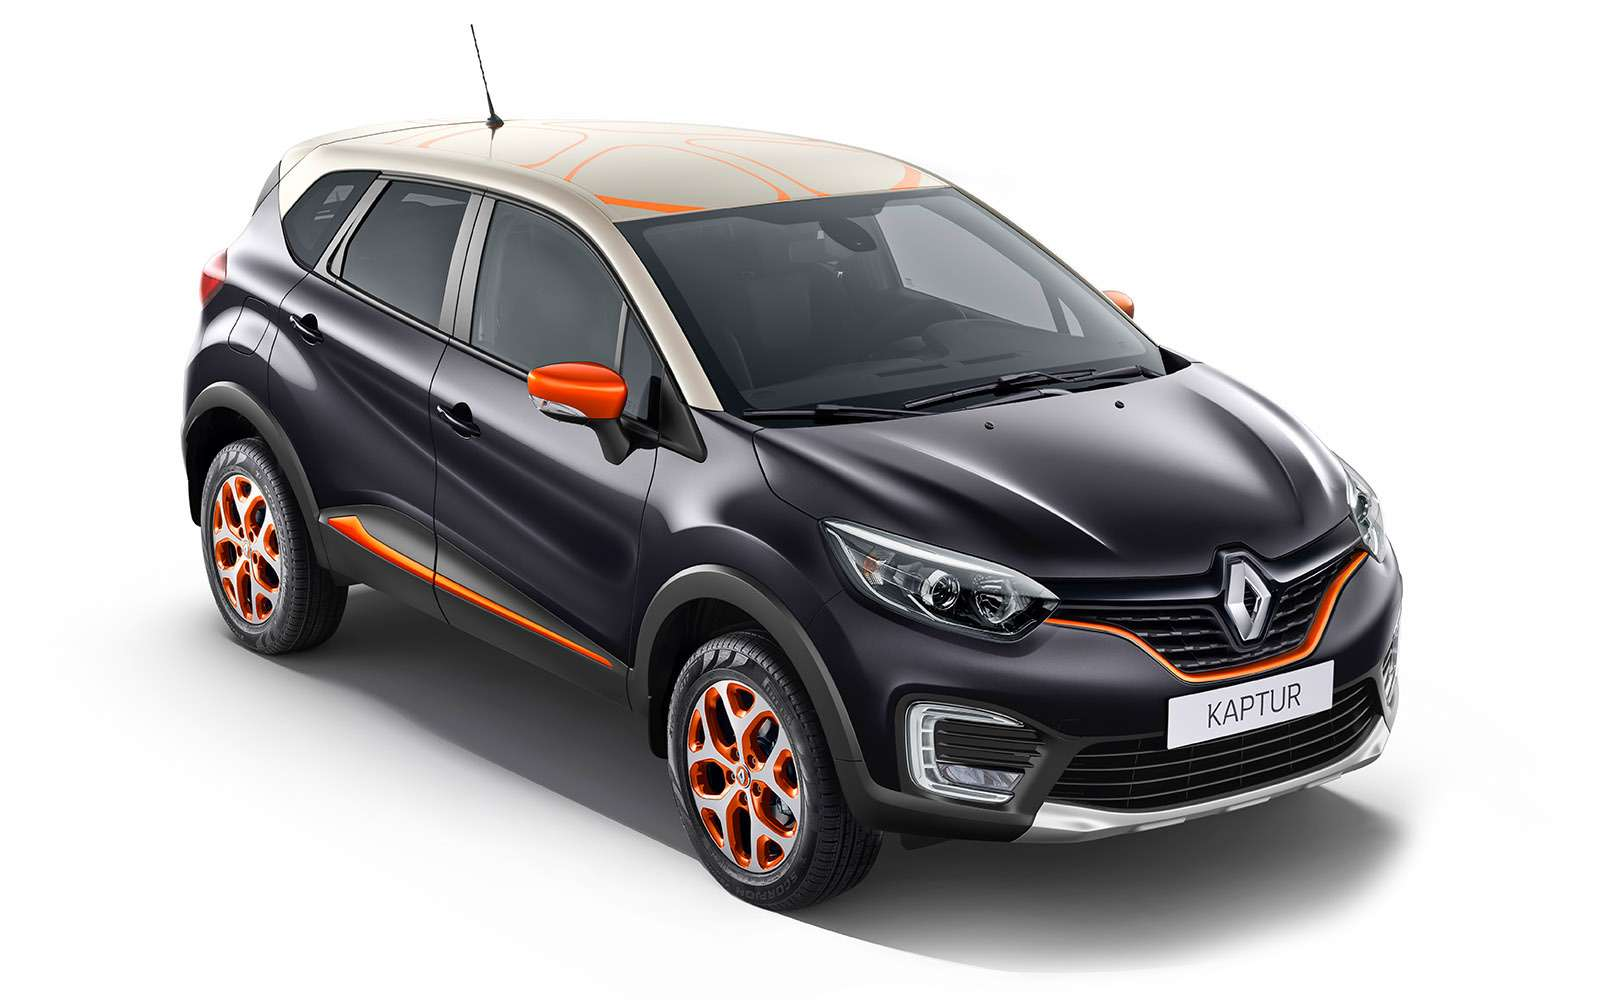 Тест Renault Kaptur CVT: проверка навариативность— фото 645095